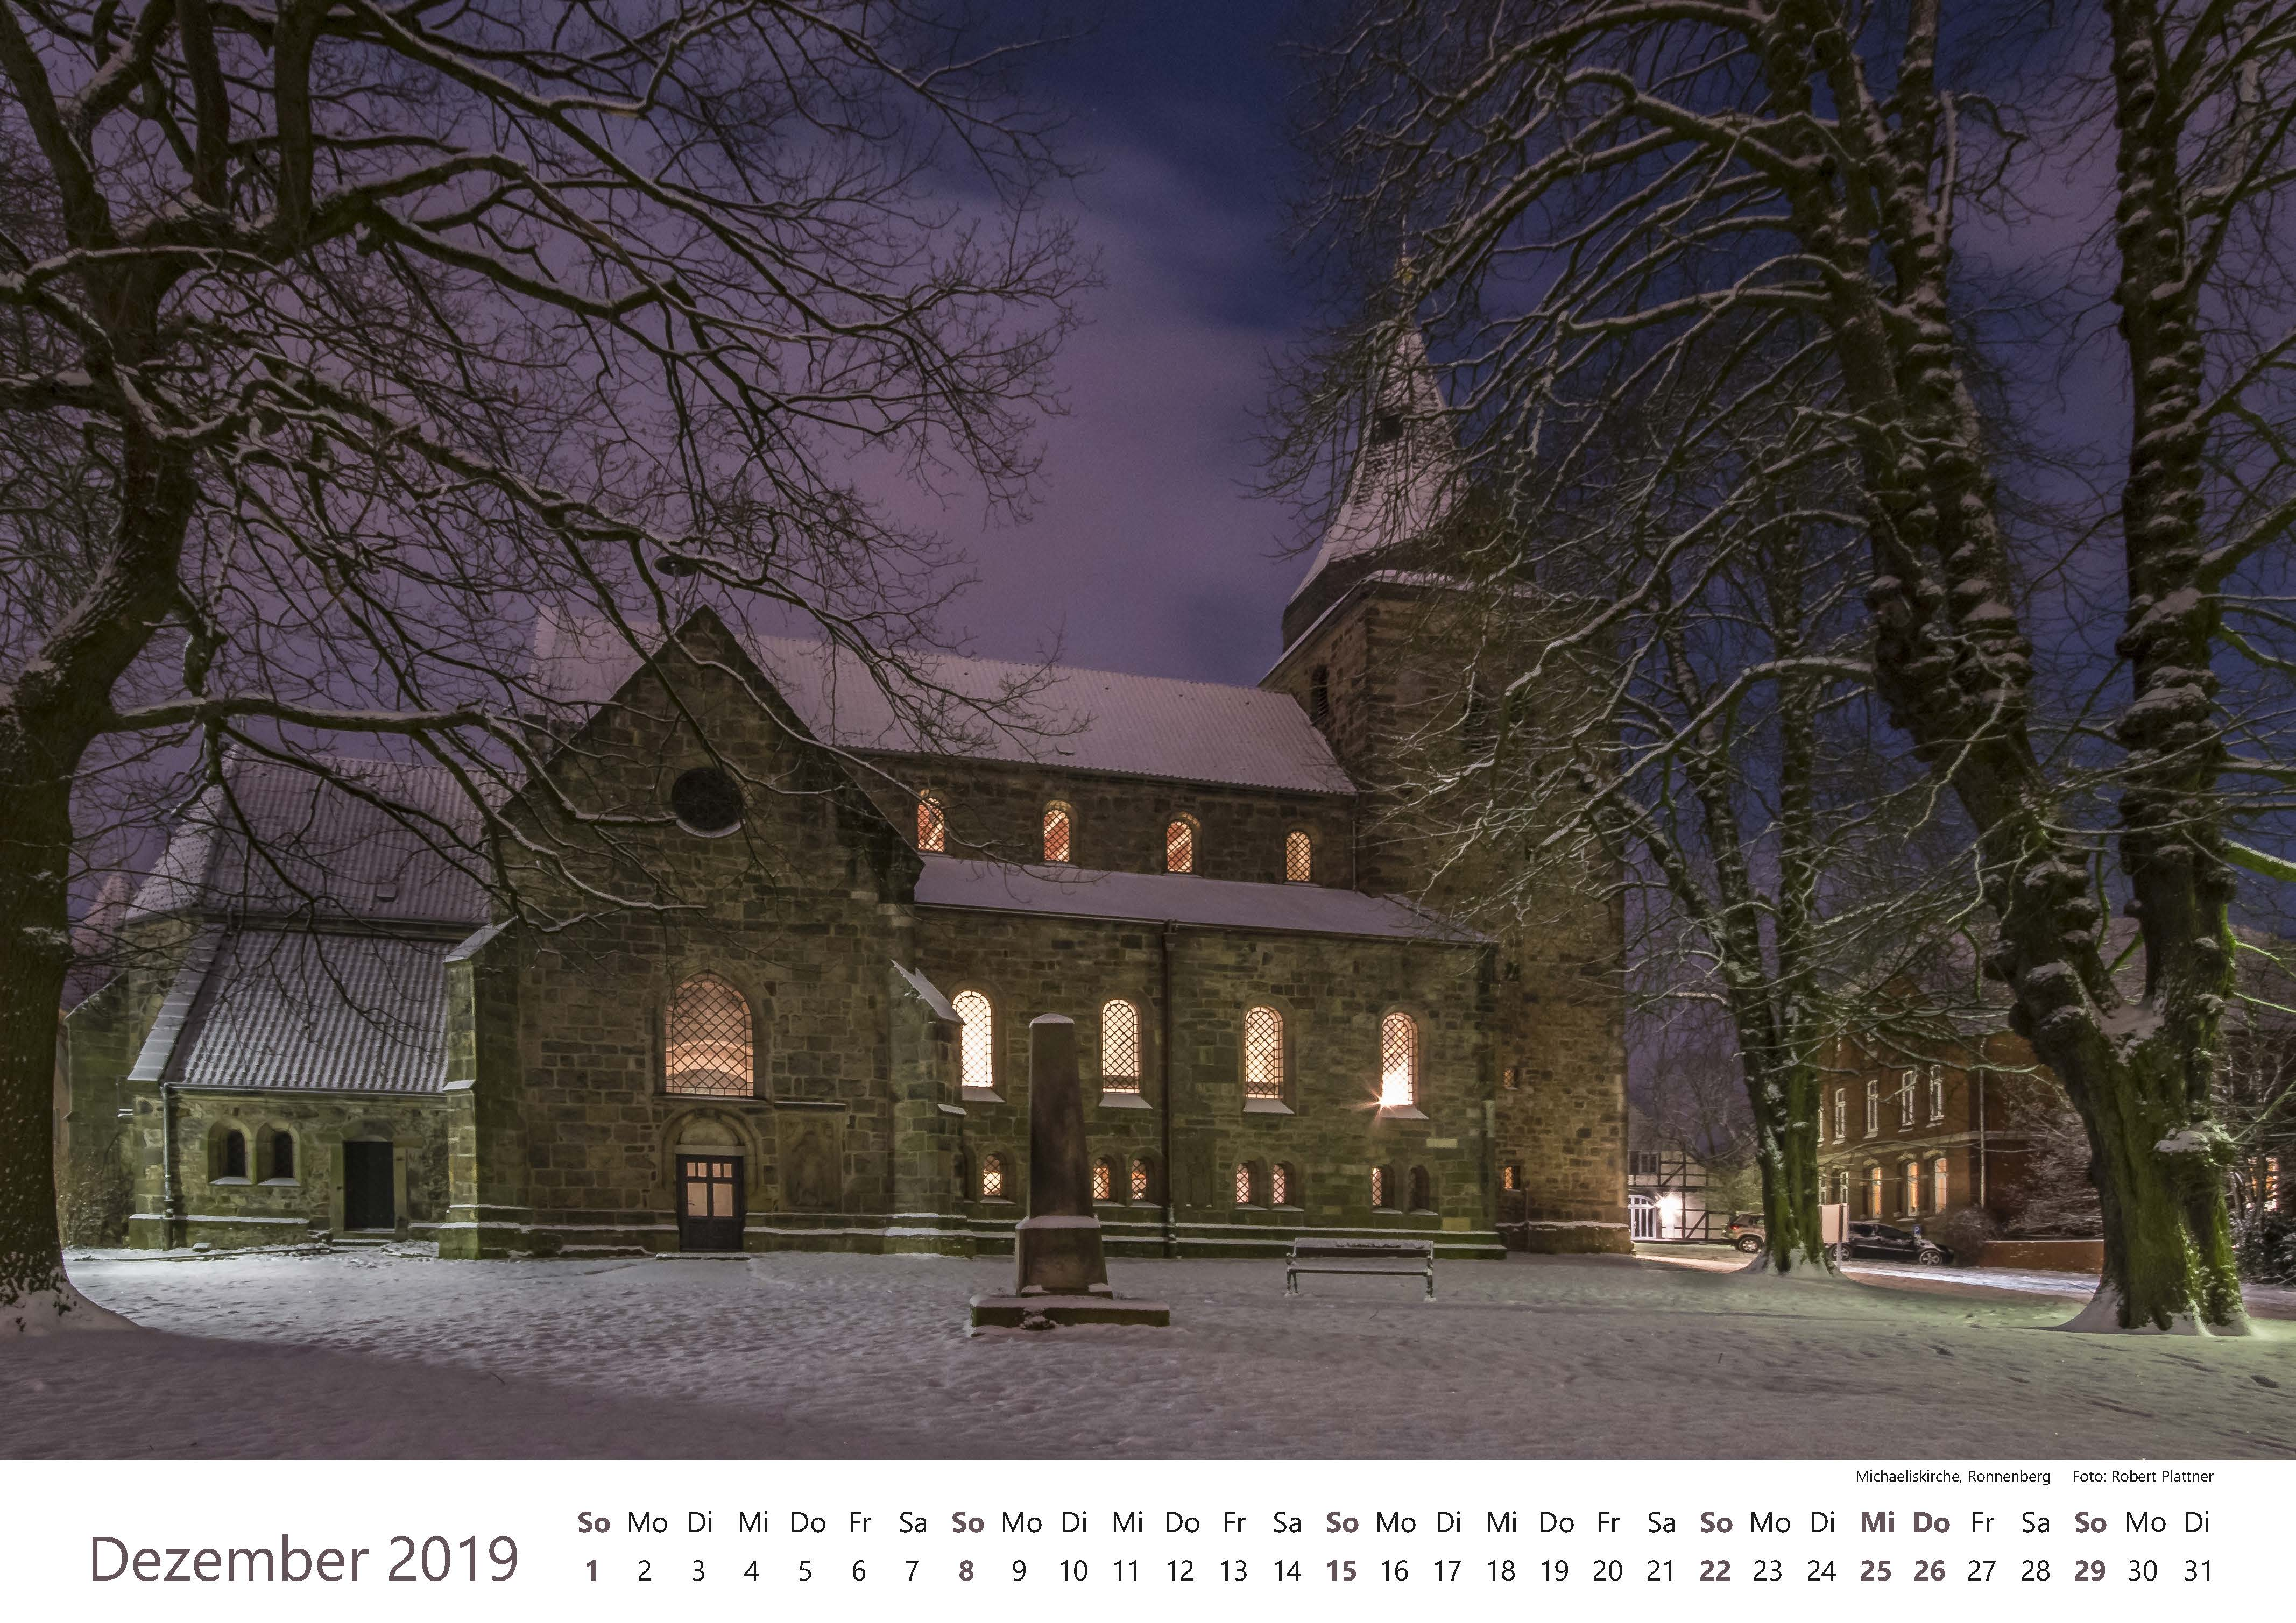 Kalender-2019-Zwischen-Ronnenberg-Deister- Robert-Plattner-Seite-12-Dezember